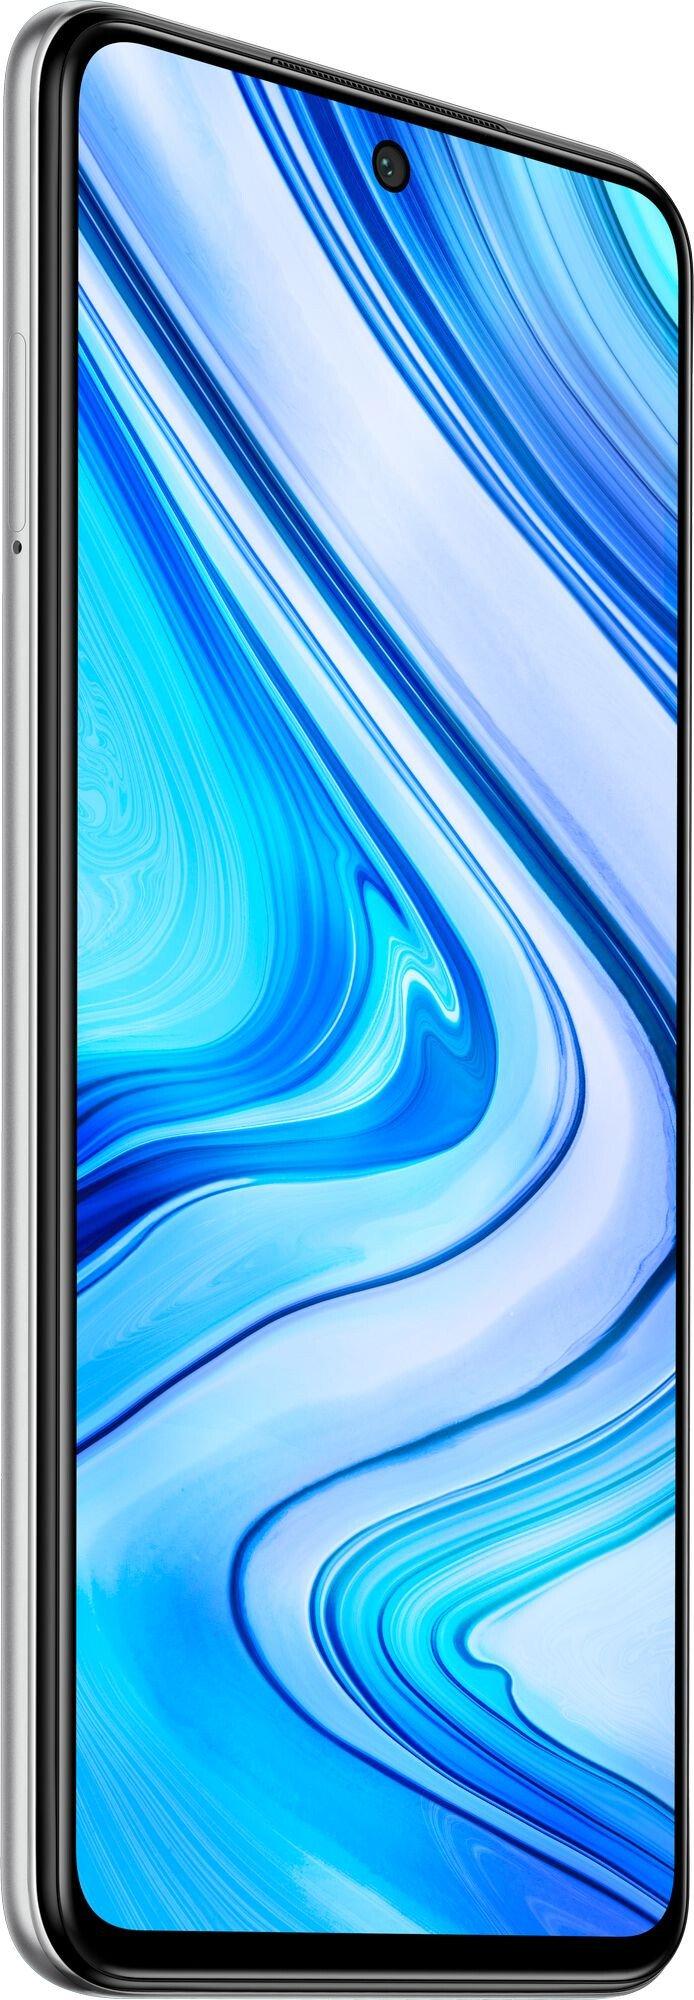 Xiaomi Redmi Note 9 Pro 6/128GB White - 3